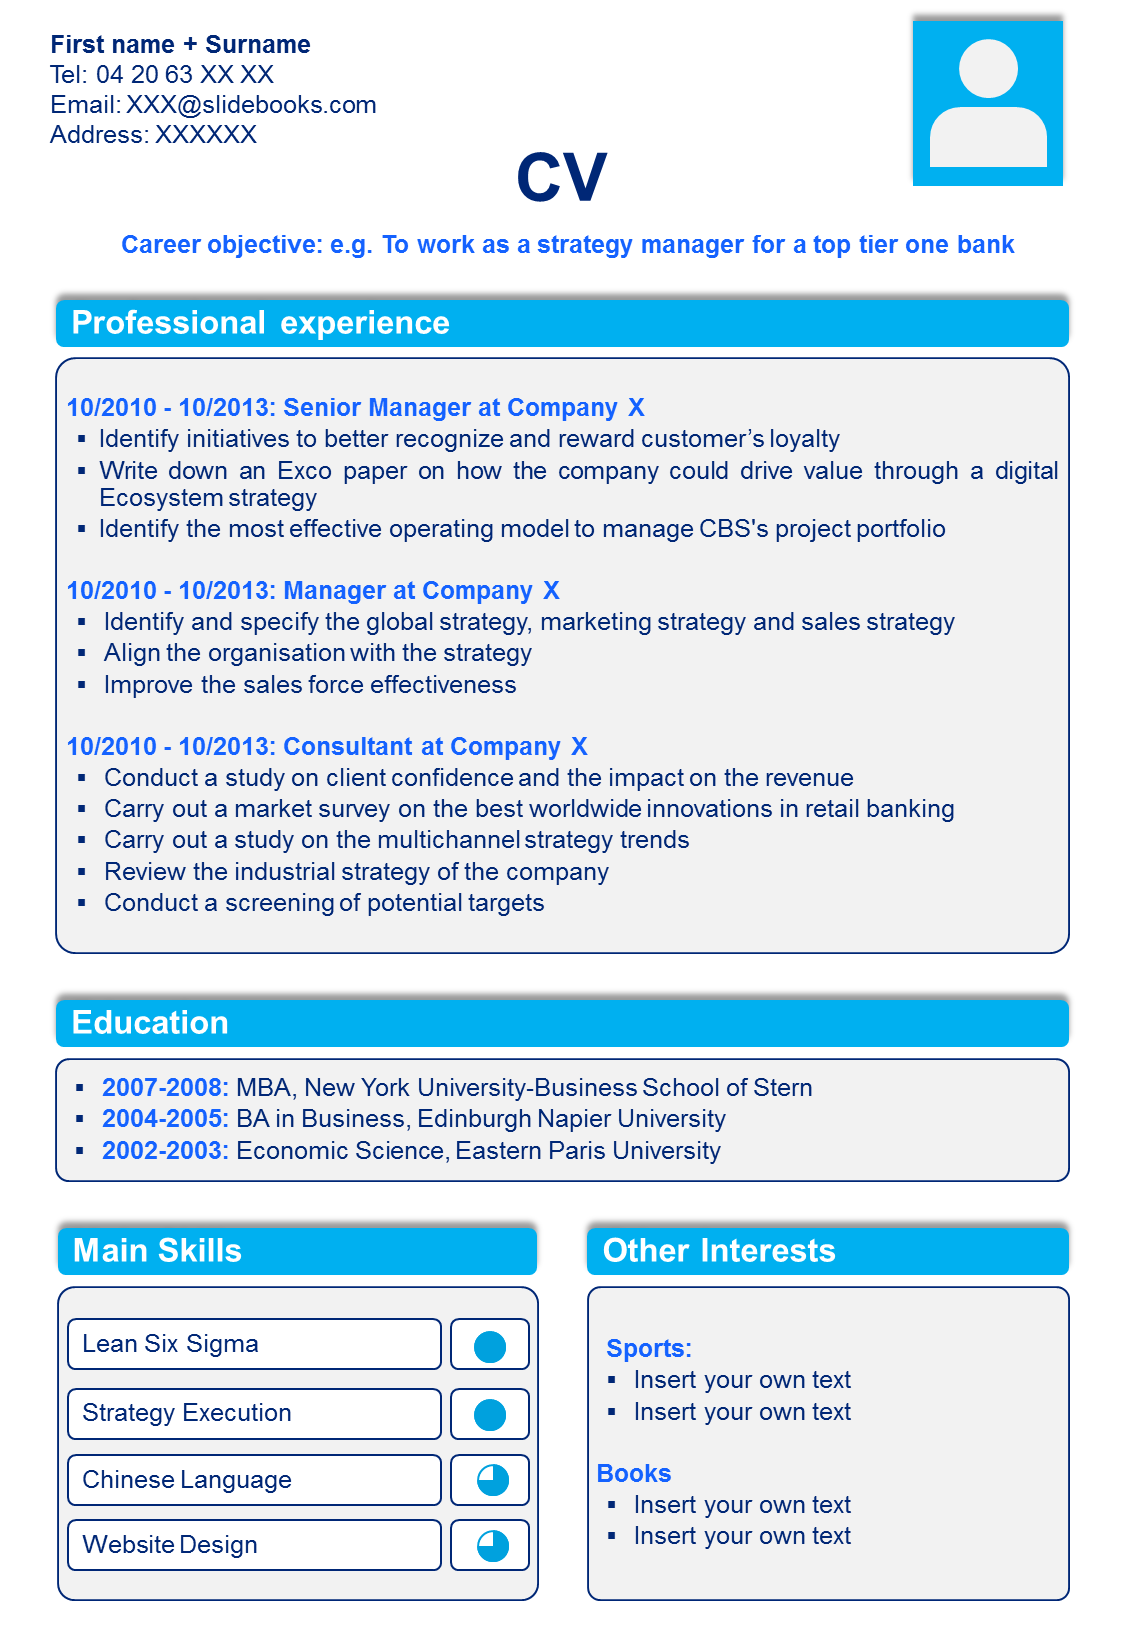 Resume / CV Templates